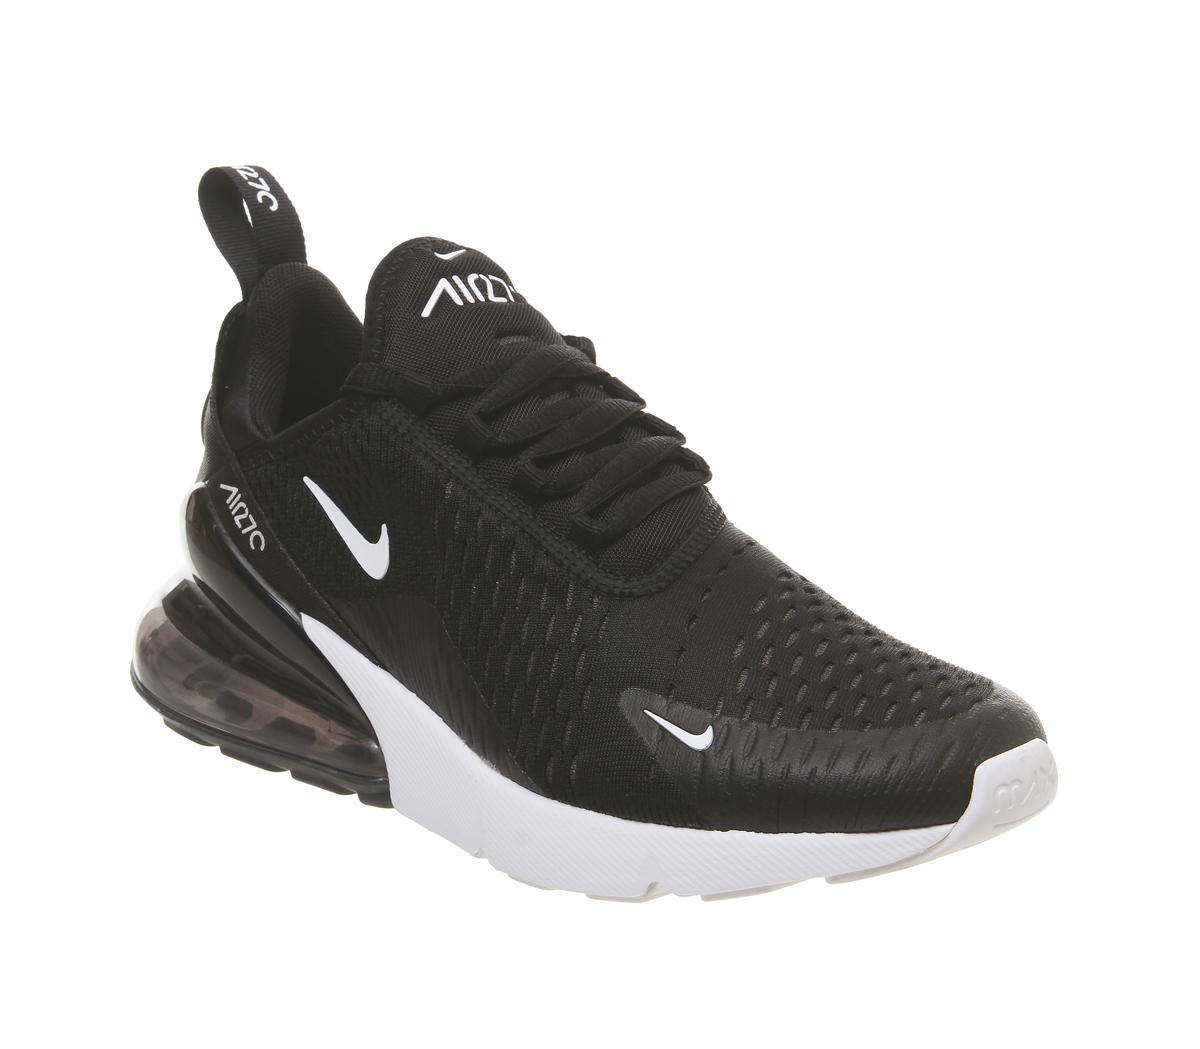 Nike Air Max 270 Blackanthracite white